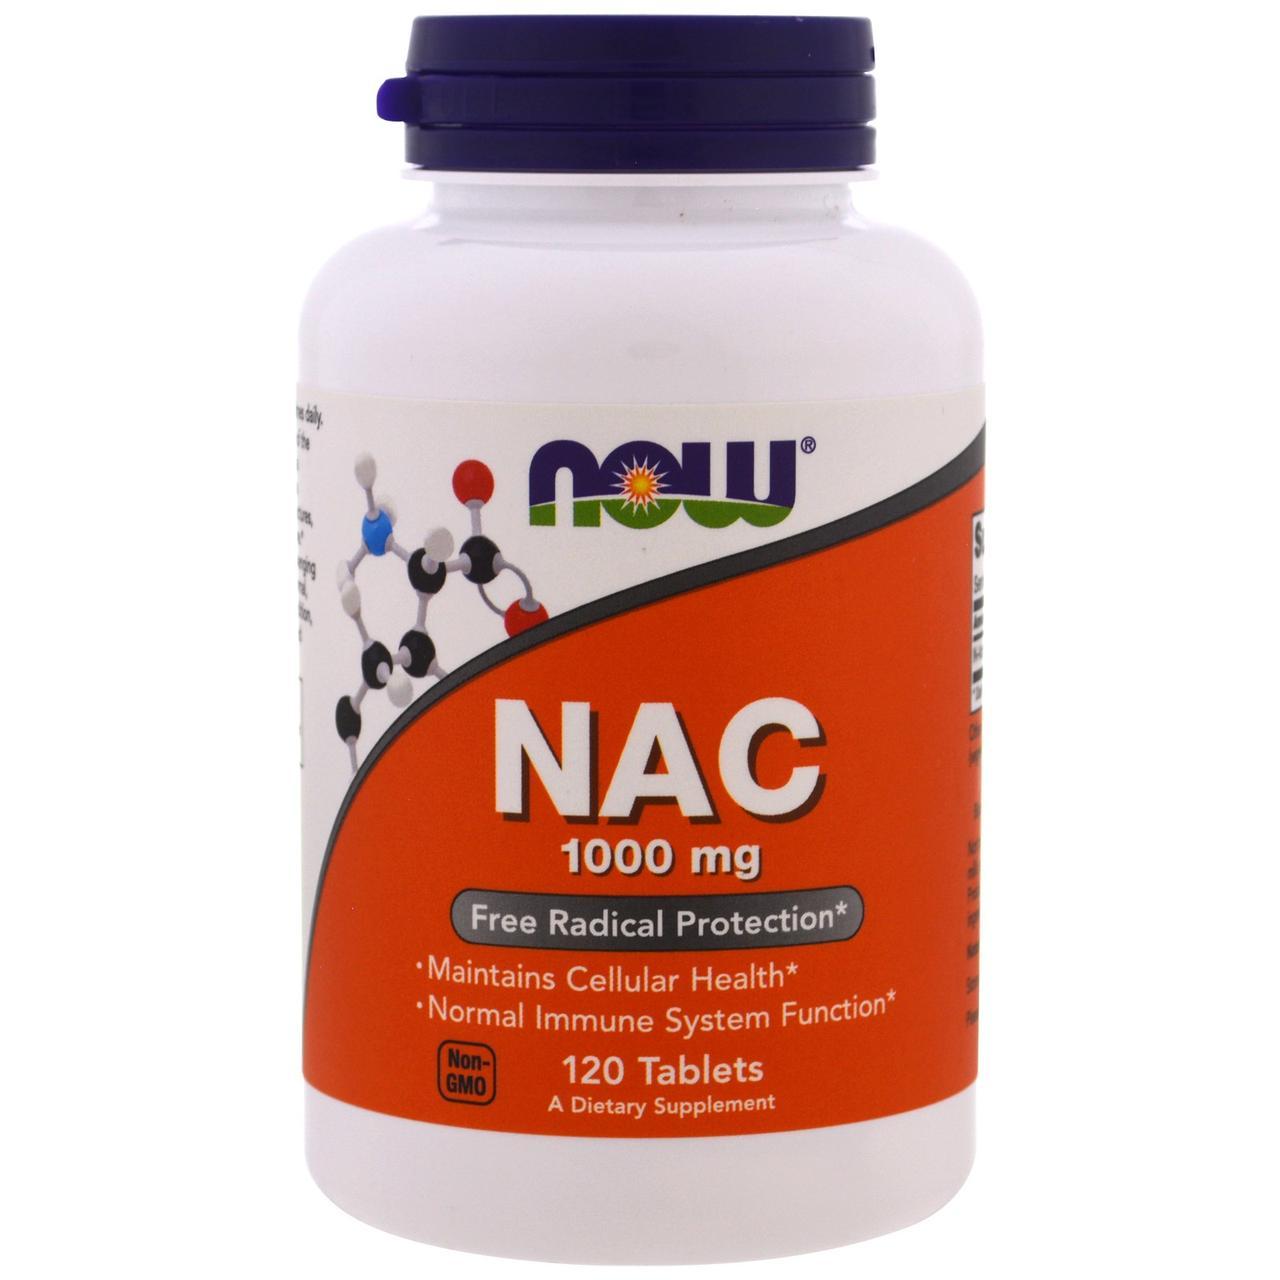 NAC (N-ацетил-L-цистеин) Now Foods, 1000 мг, 120 таблеток